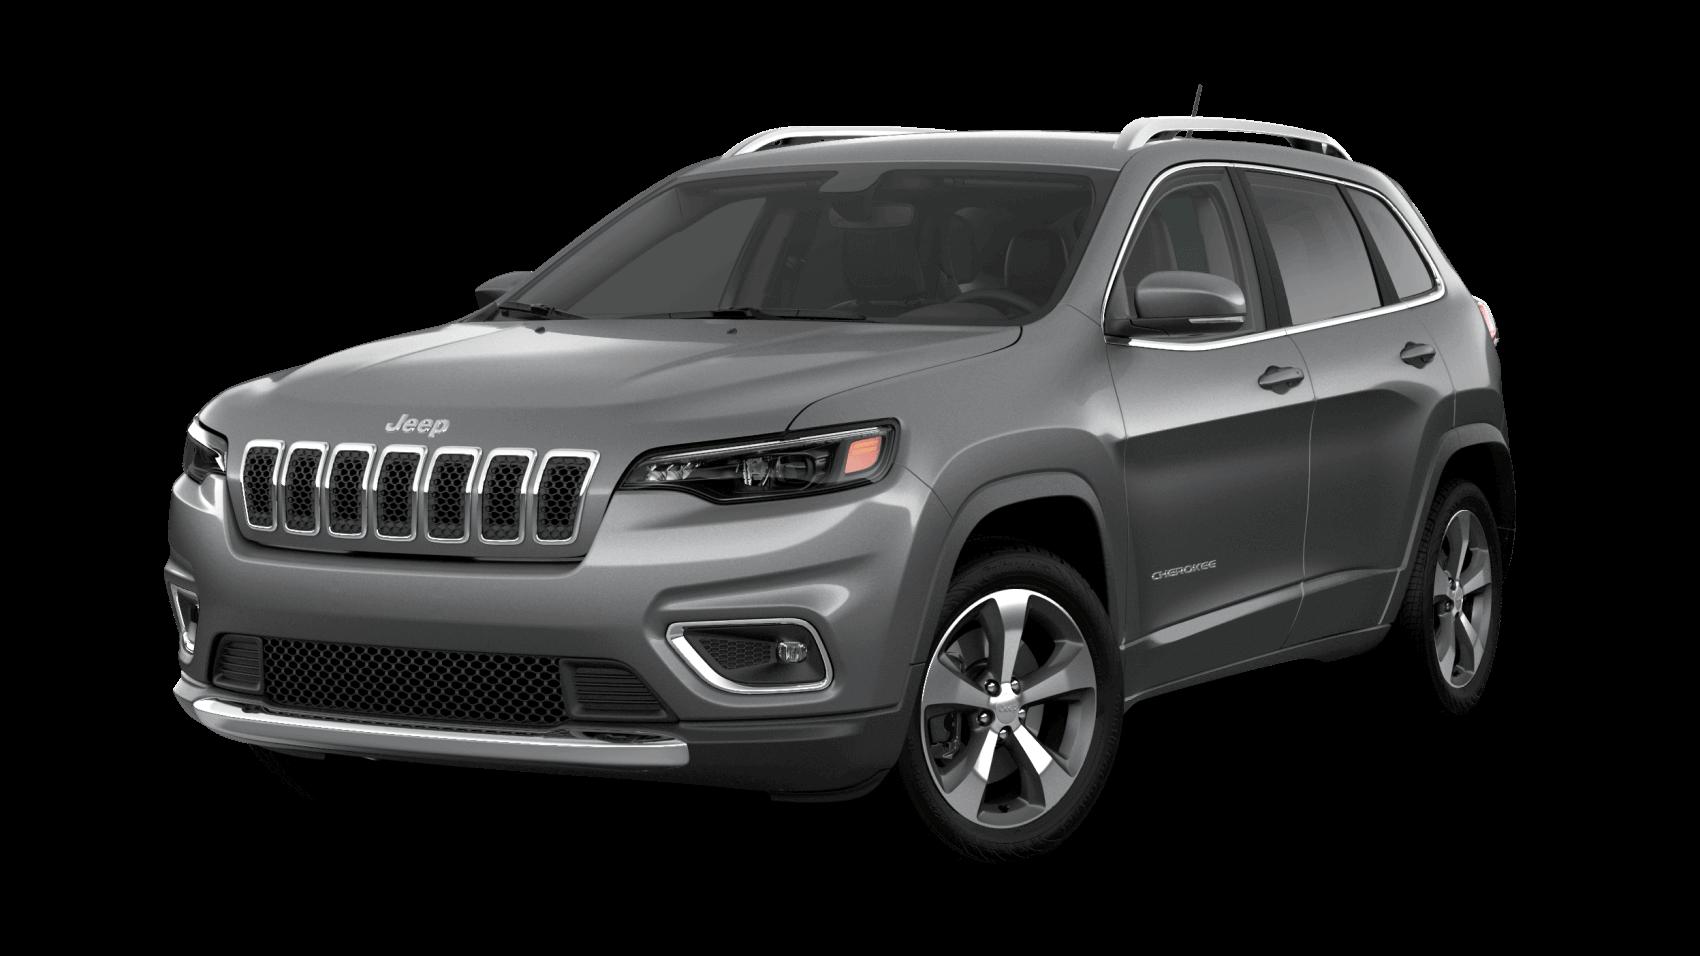 2021 Jeep Cherokee Silver